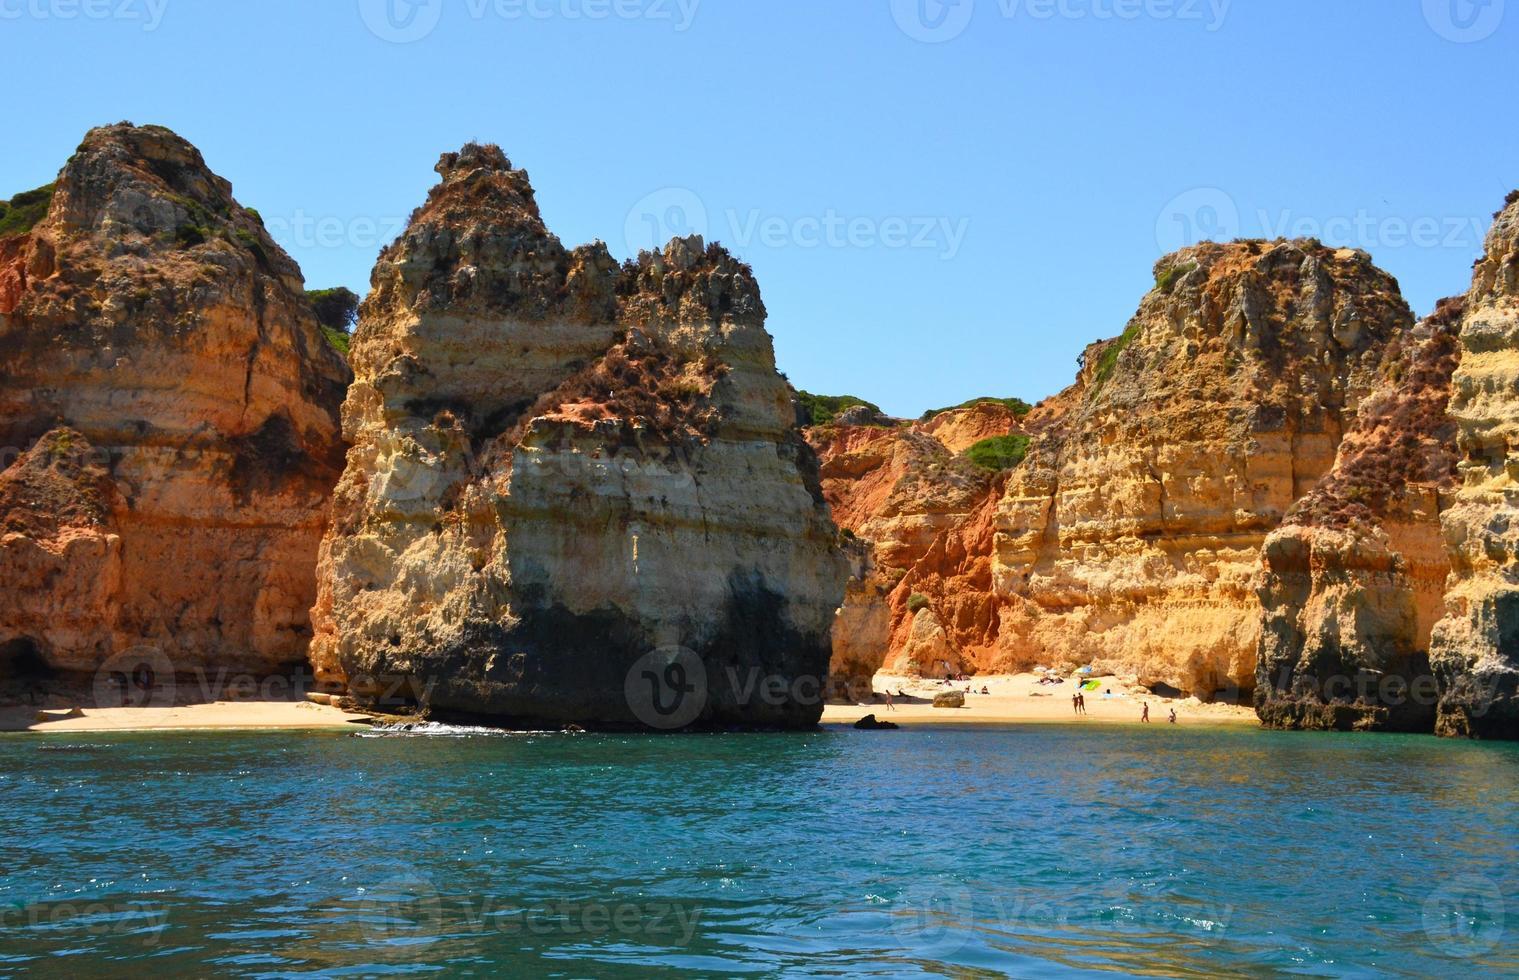 rochas e praia em portugal, lagos foto